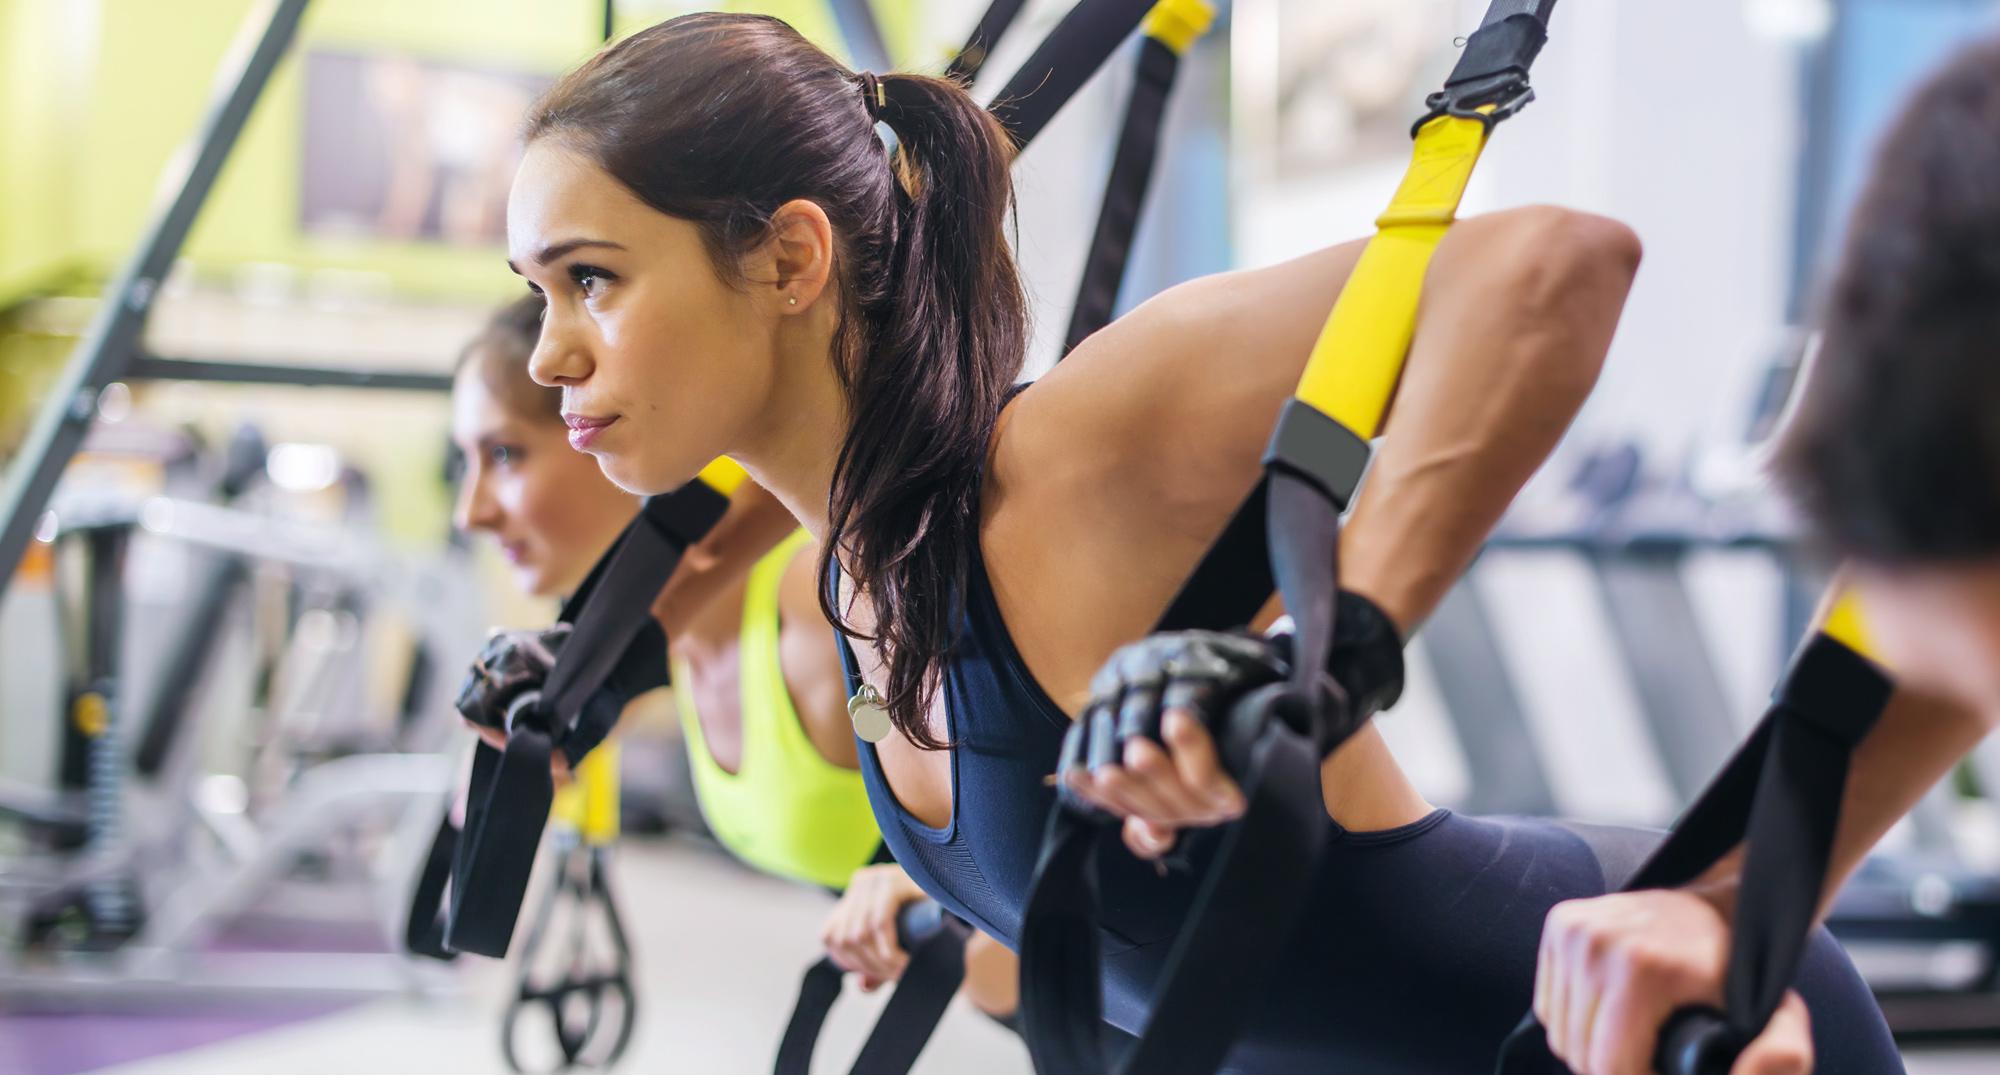 FITNESS: High Intensity – Training Benefits